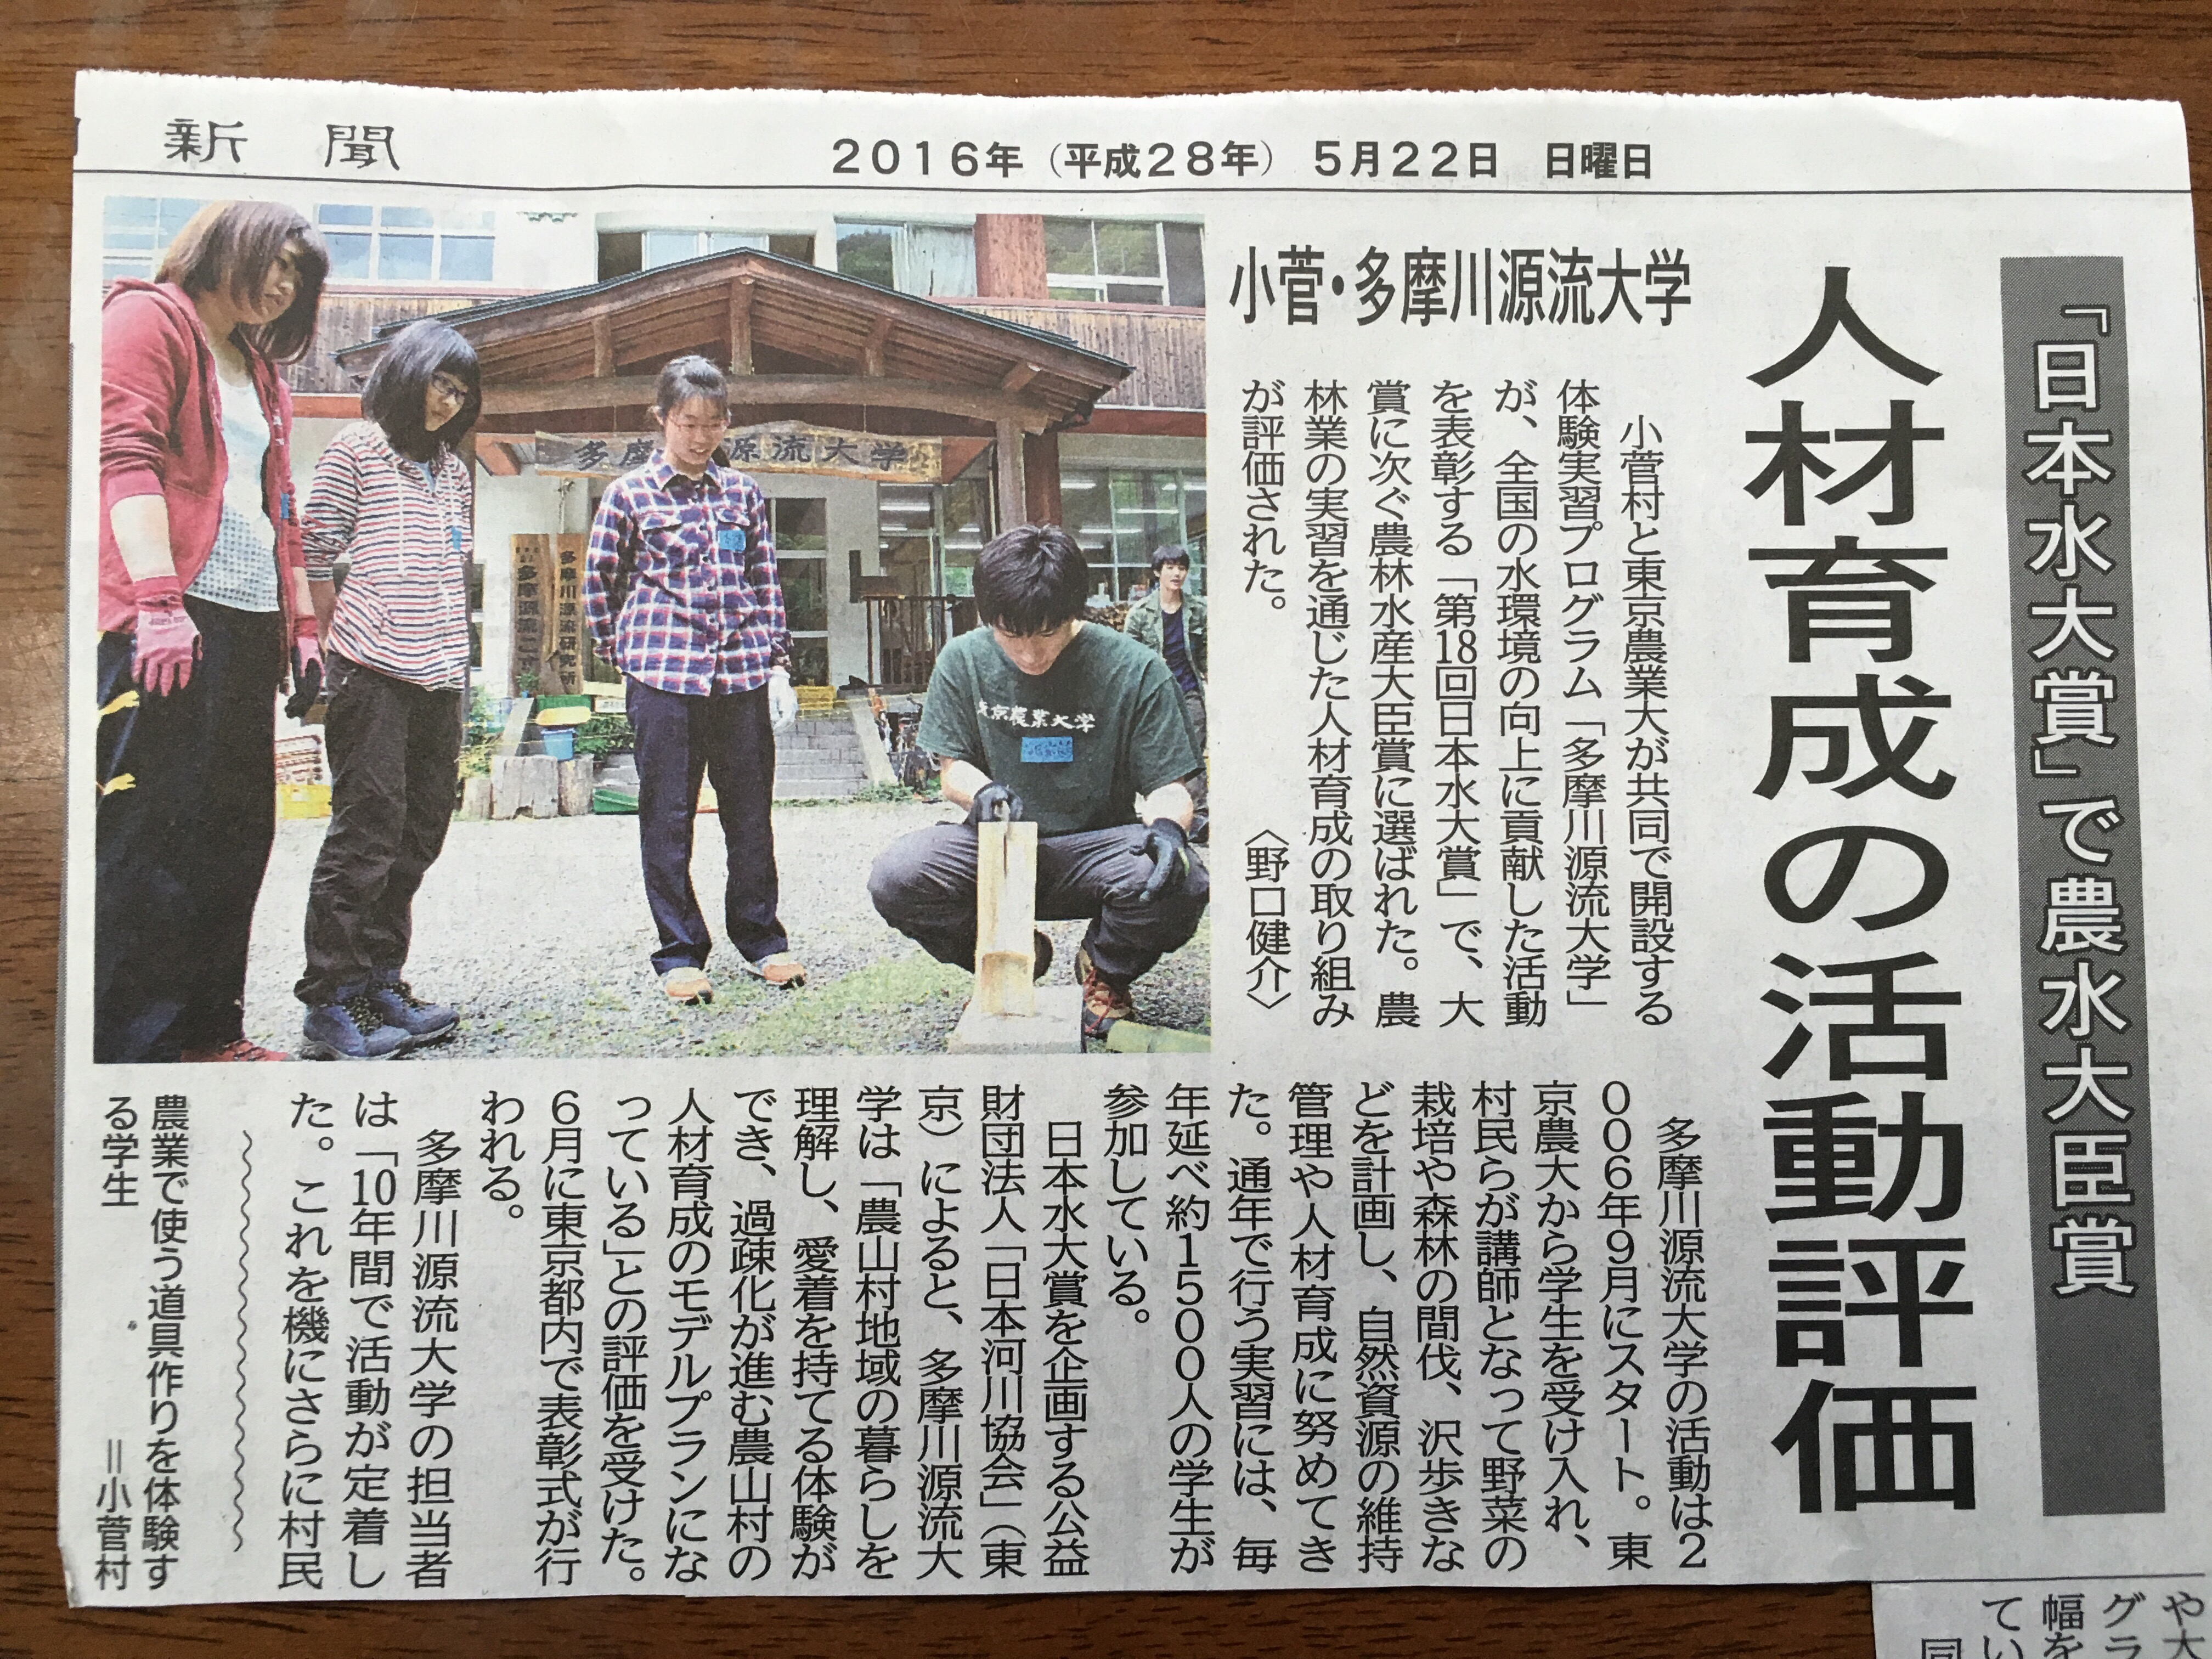 【山梨日日新聞】源流大学が「日本水大賞」で農水大臣賞を受賞